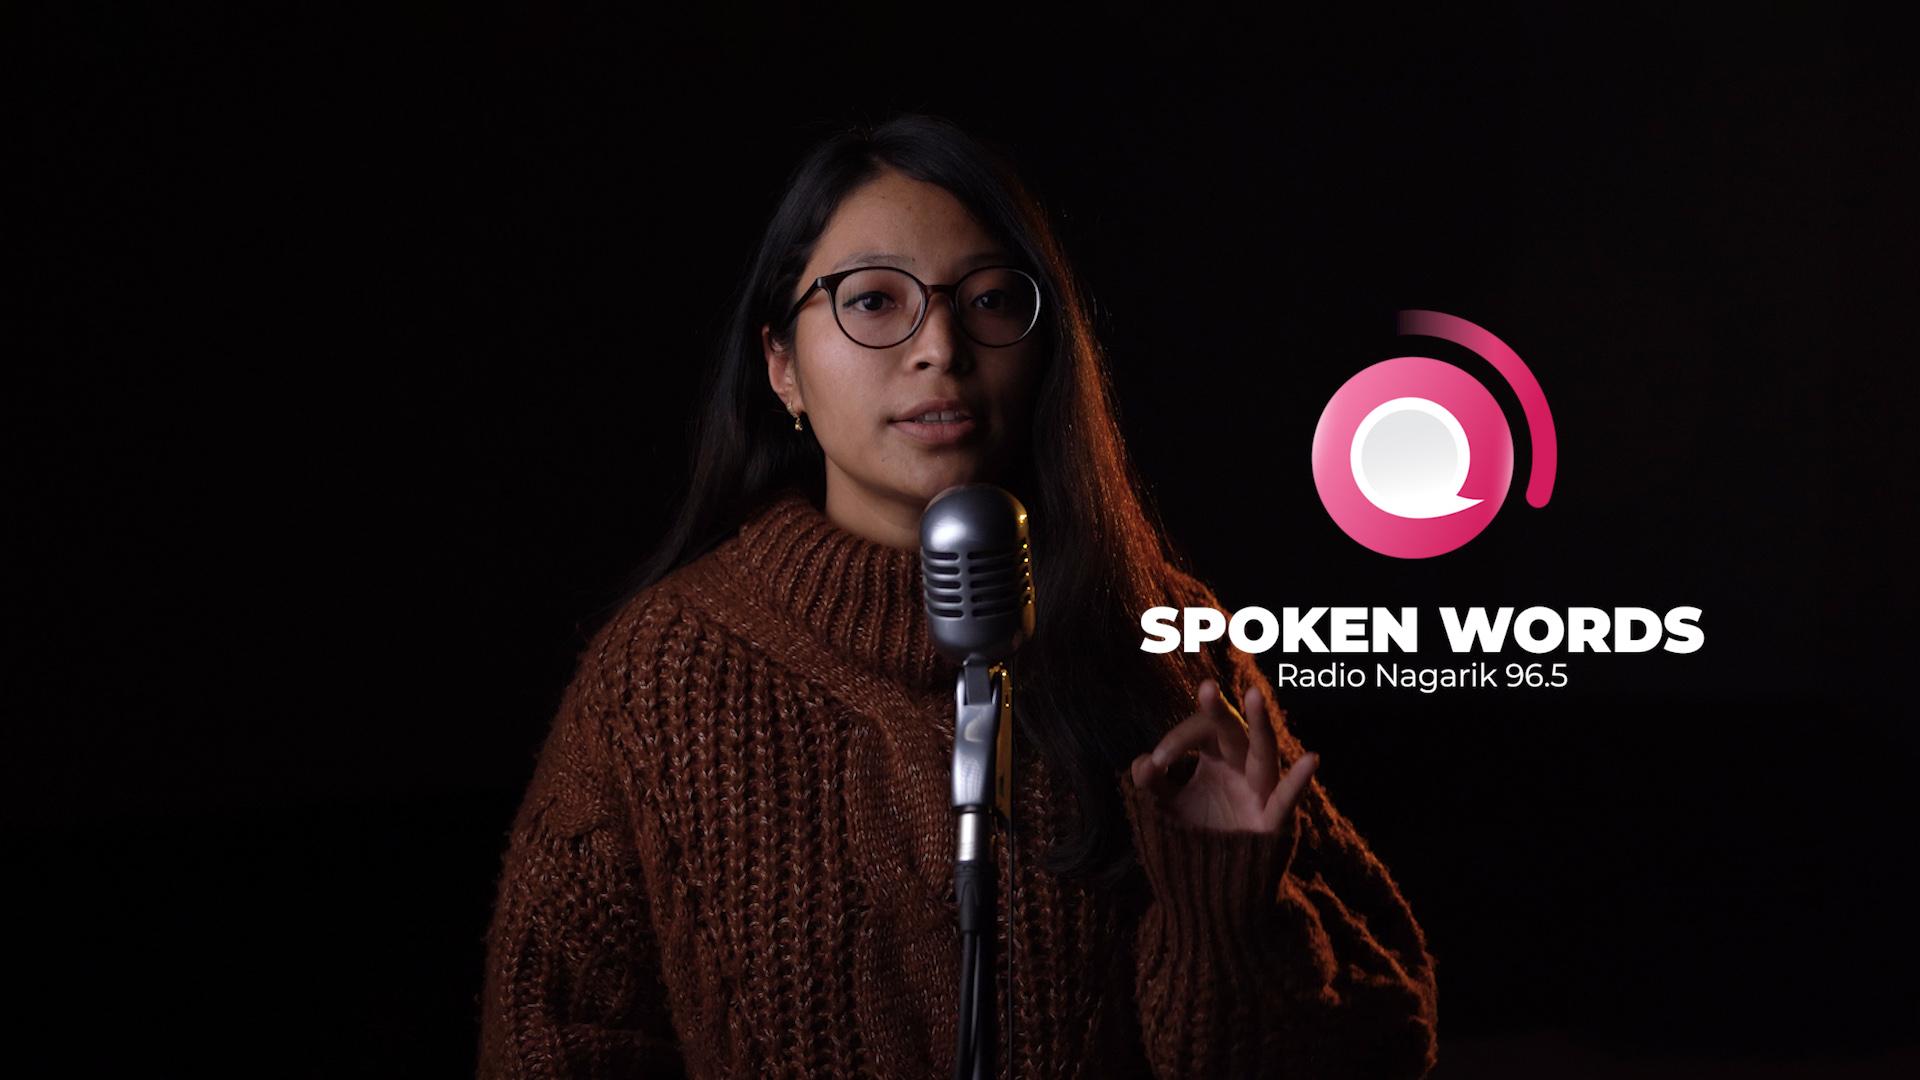 'Lutiyeko Asmita' ( लुटिएको अस्मिता ) | Spoken Words performed by Aishwarya Rai